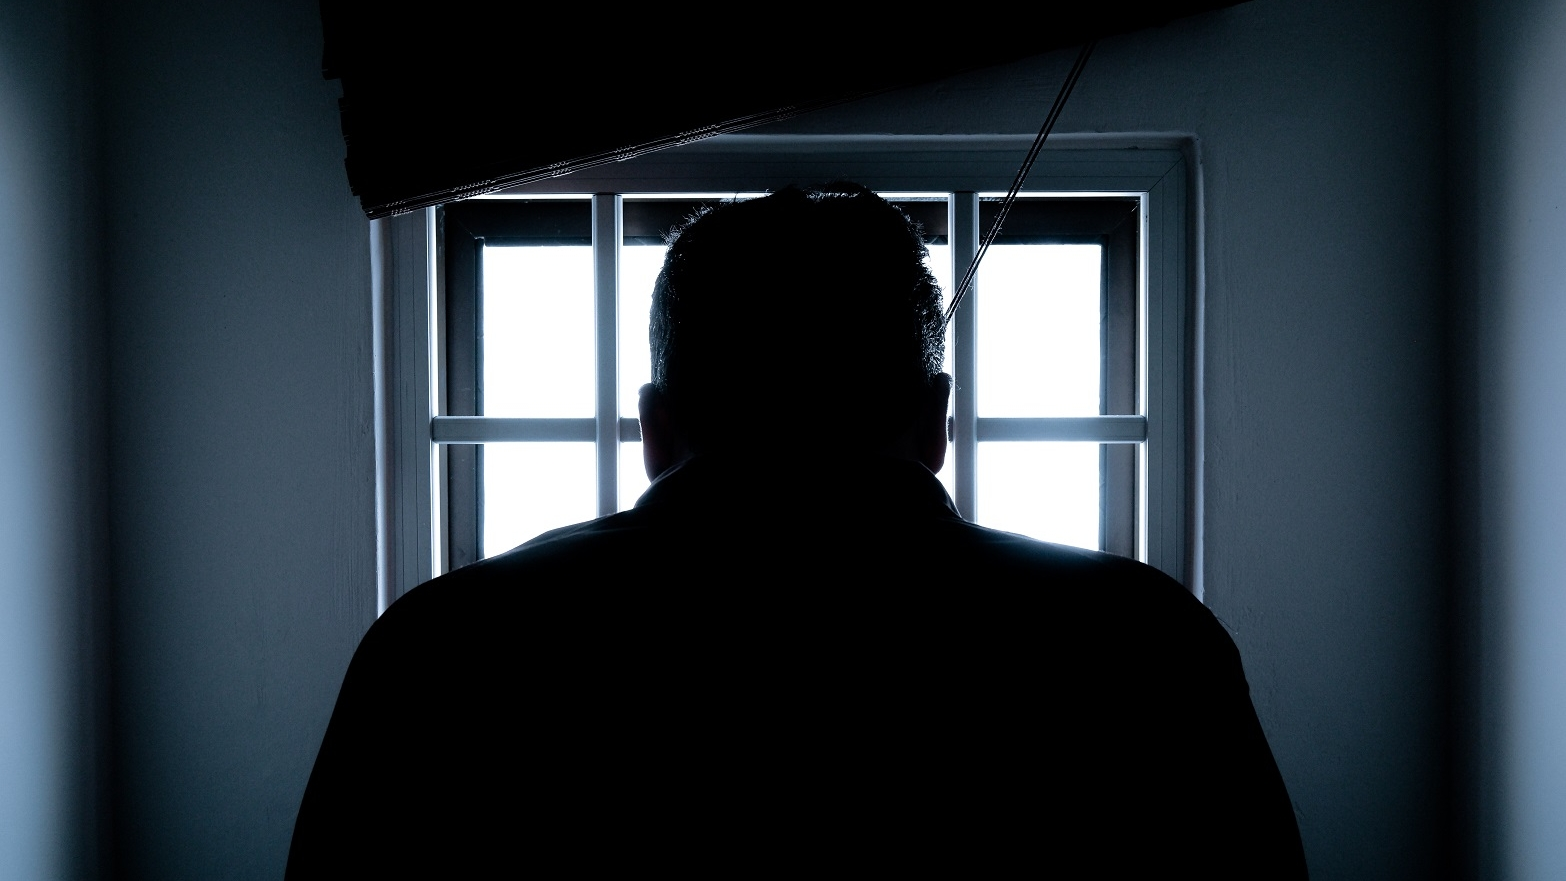 prison_photo_pexels_170920.jpg